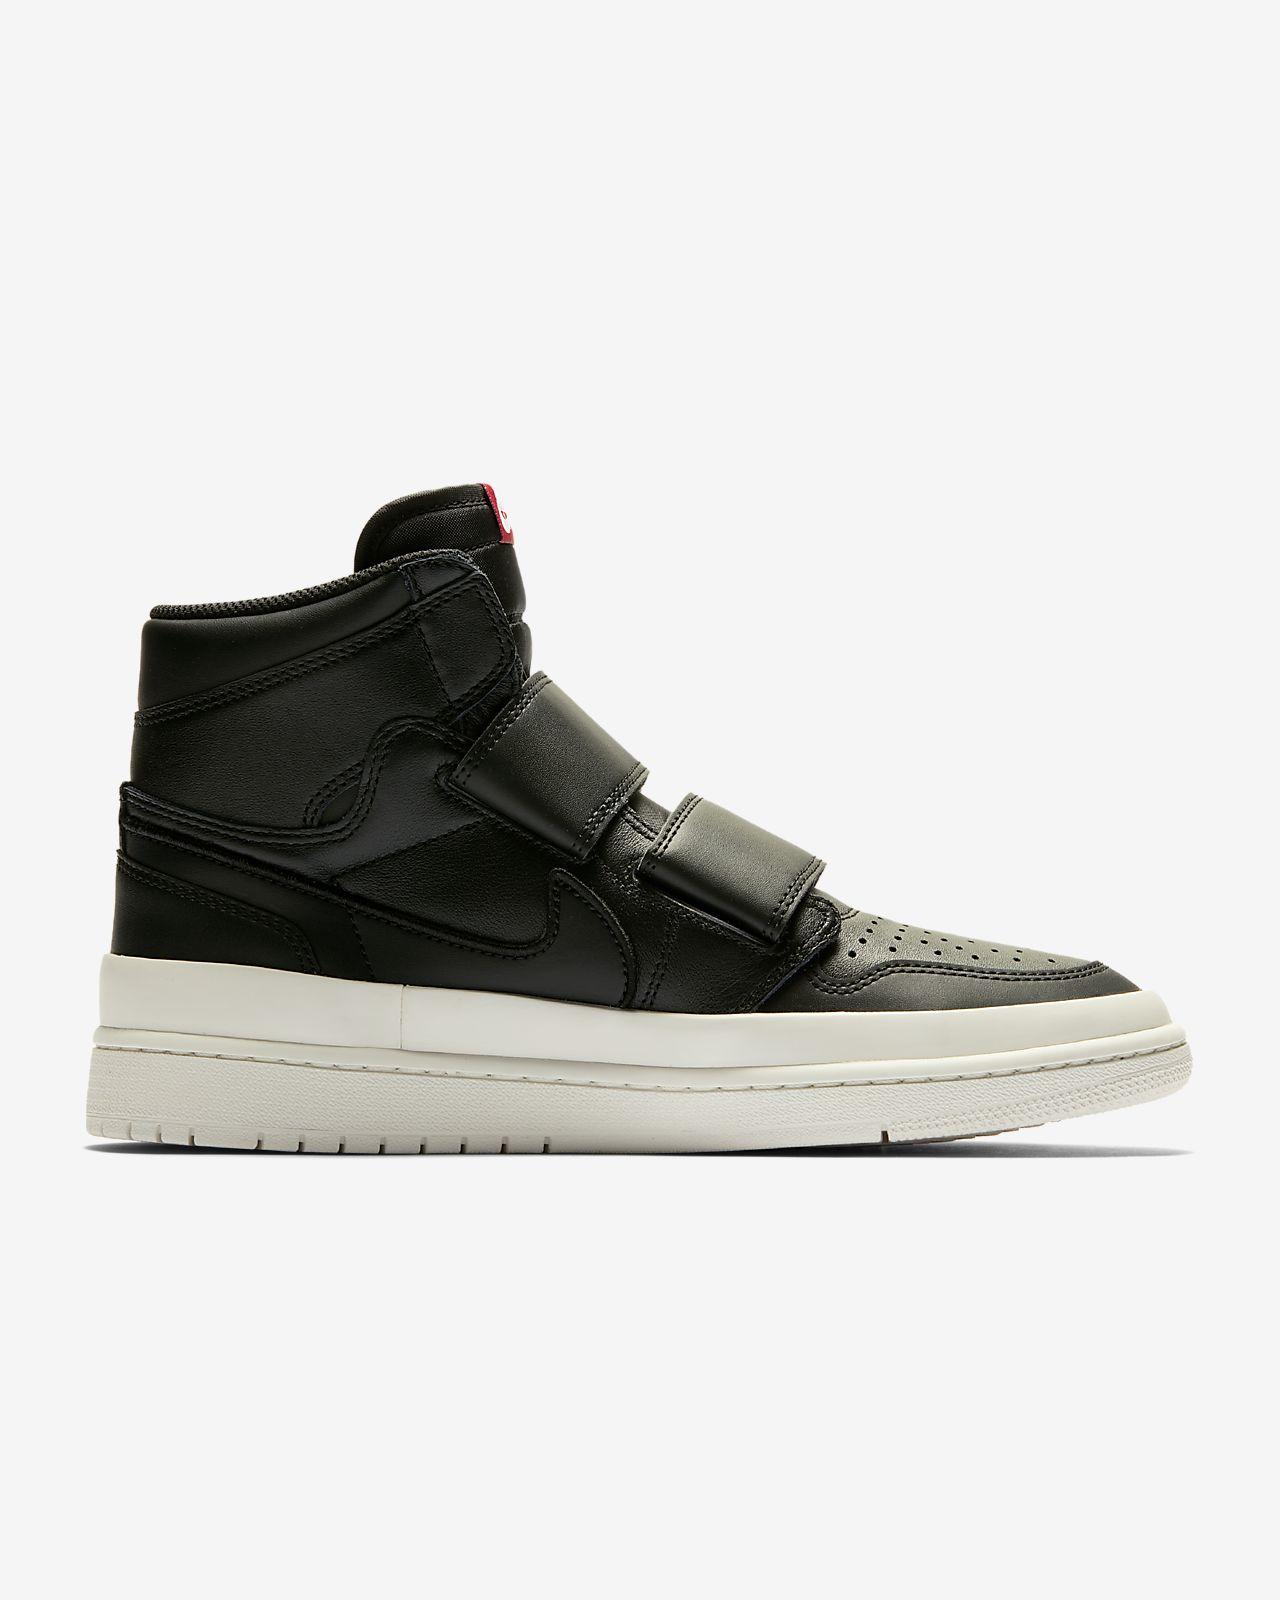 aa92aca64867 Air Jordan 1 Retro High Double-Strap Men s Shoe. Nike.com LU